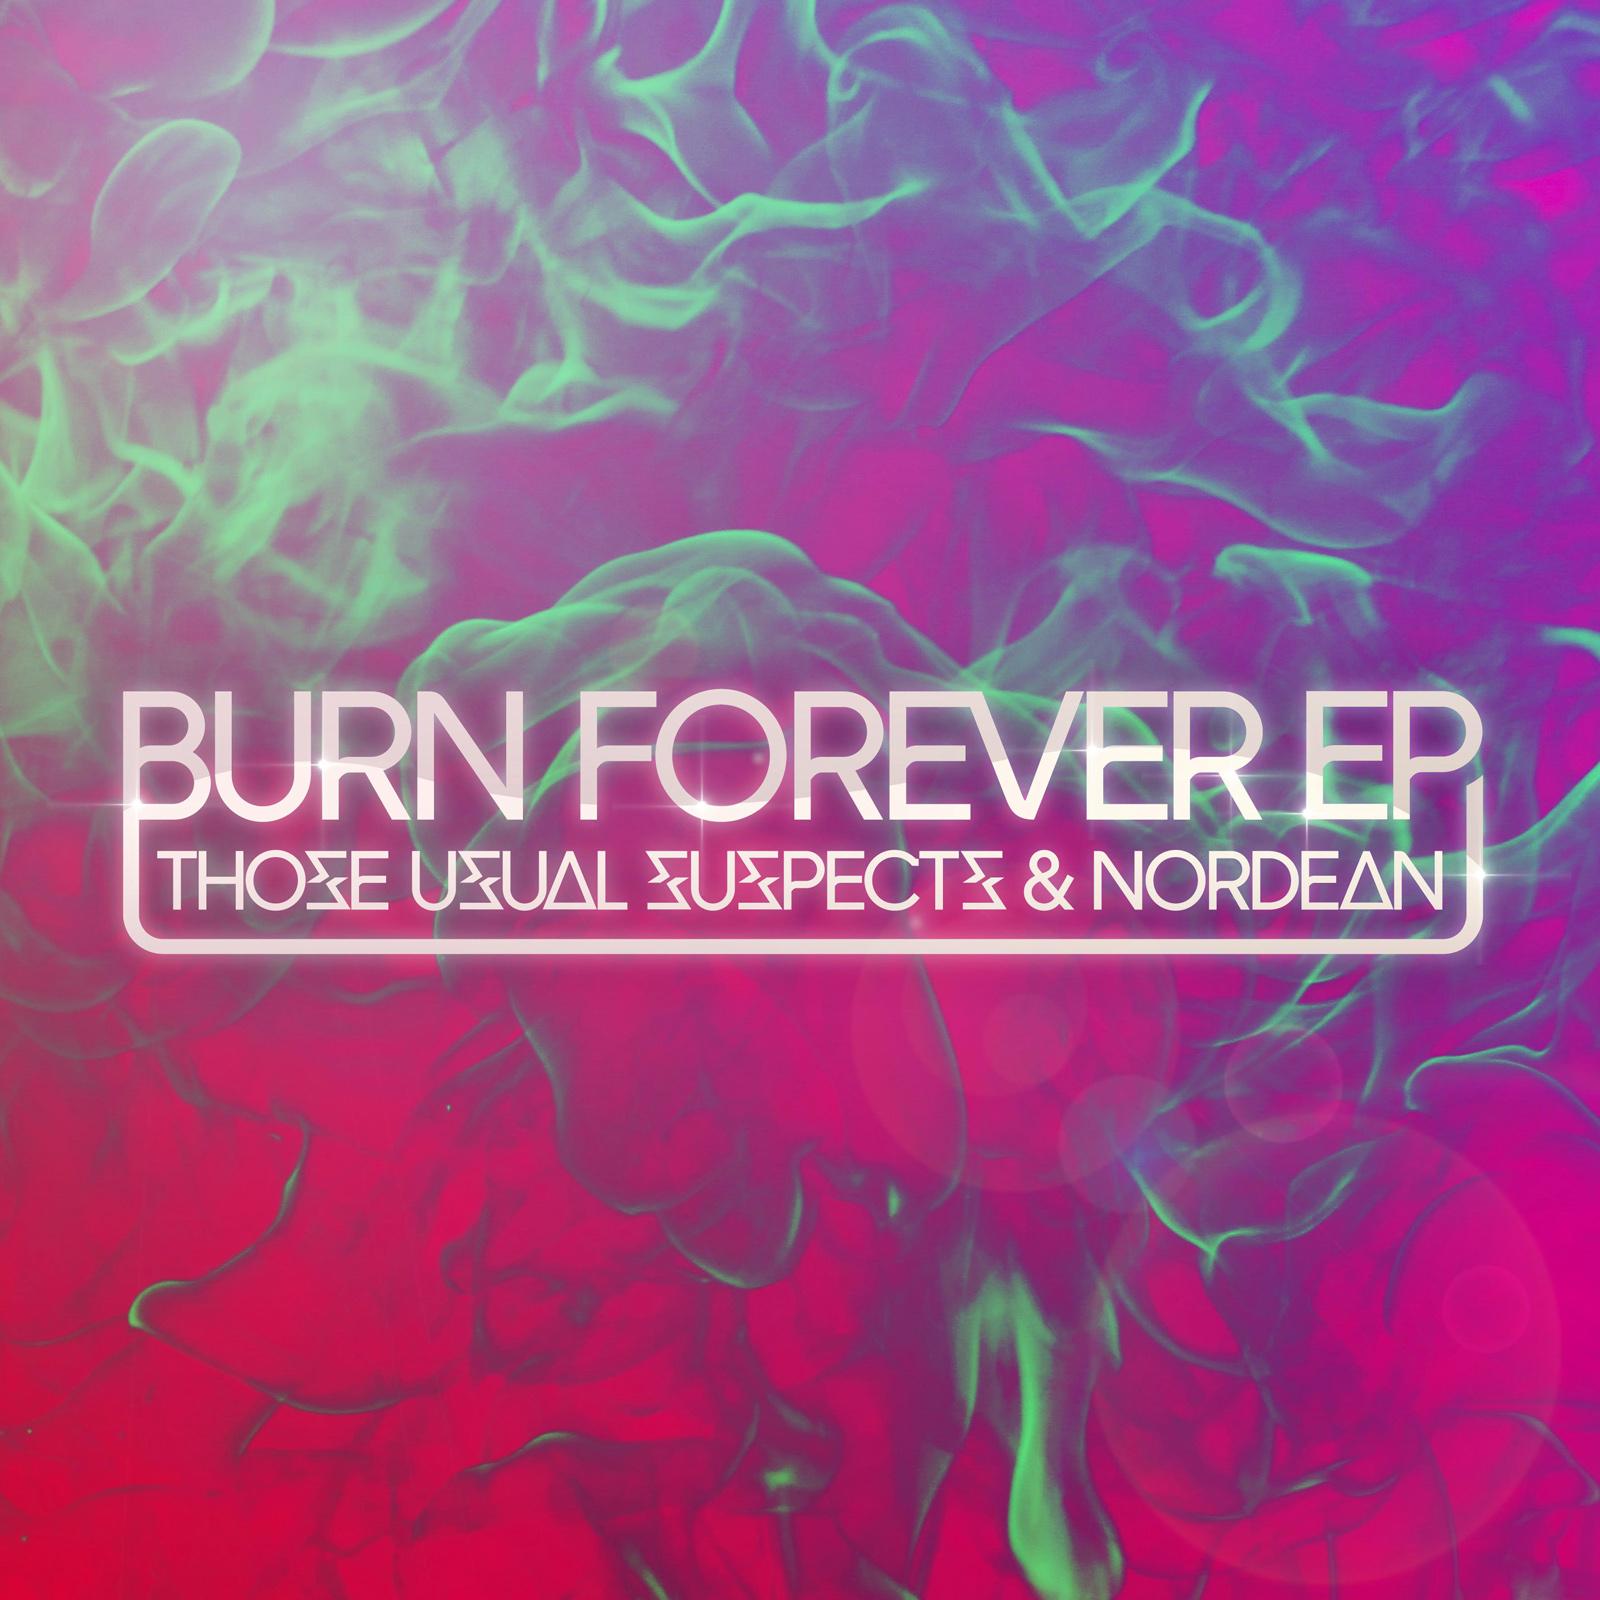 burn_forever_cover_update_1600x1600_300DPI